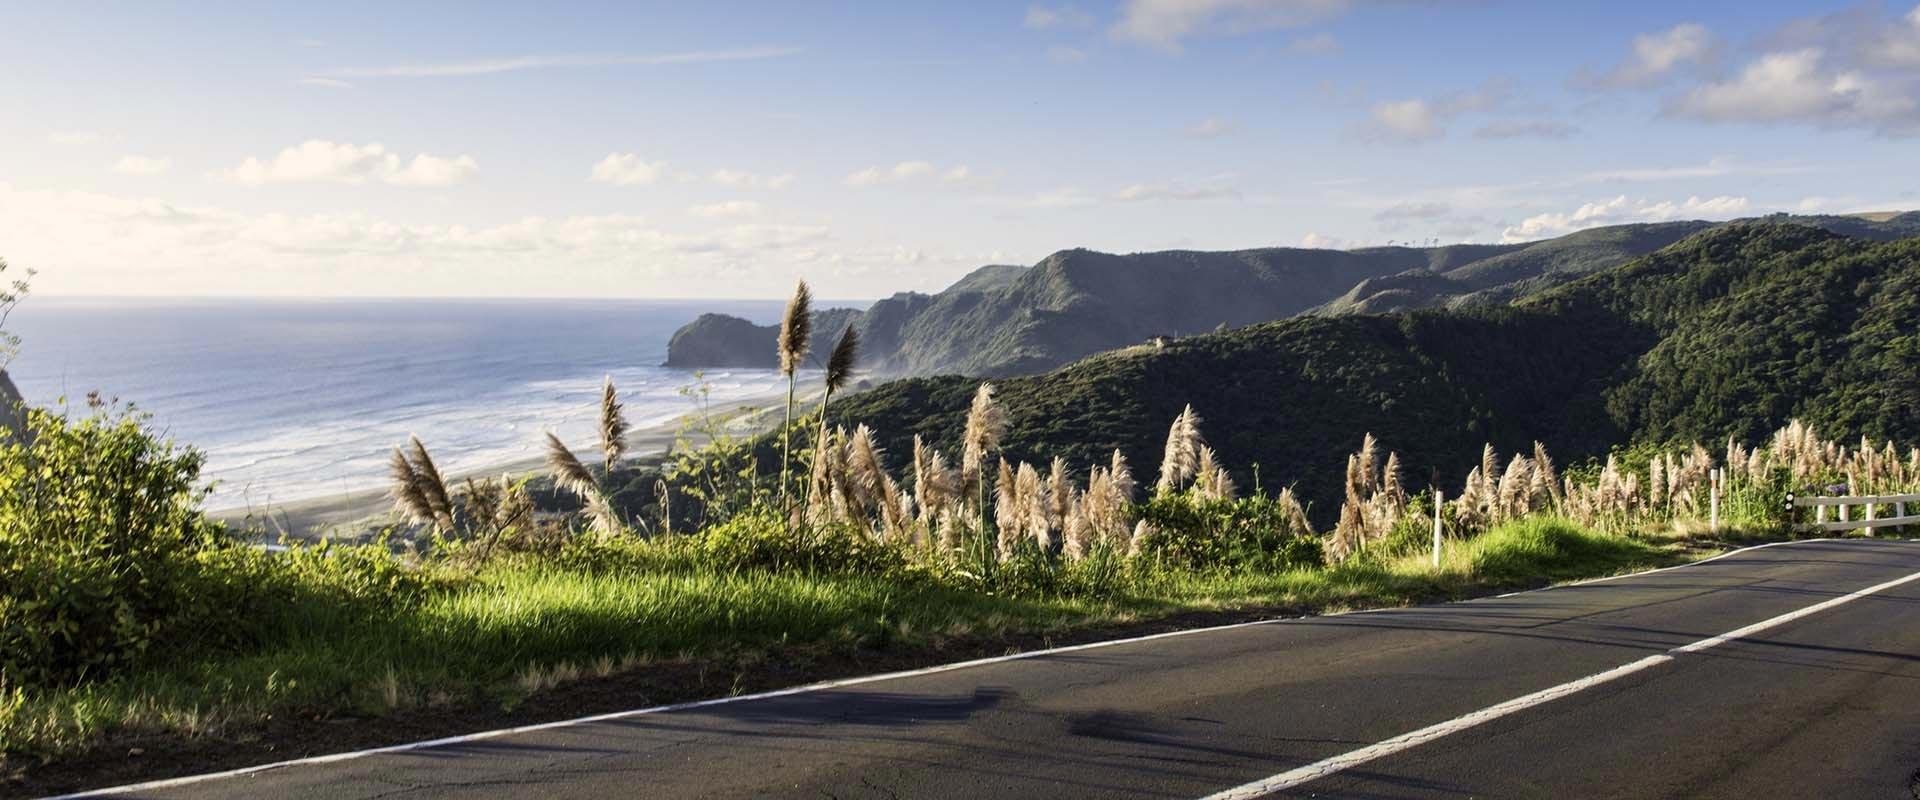 New Zealand Public Holidays 2020 - Publicholidays.co.nz Exceptional 2020 Calendar Nz Public Holidays